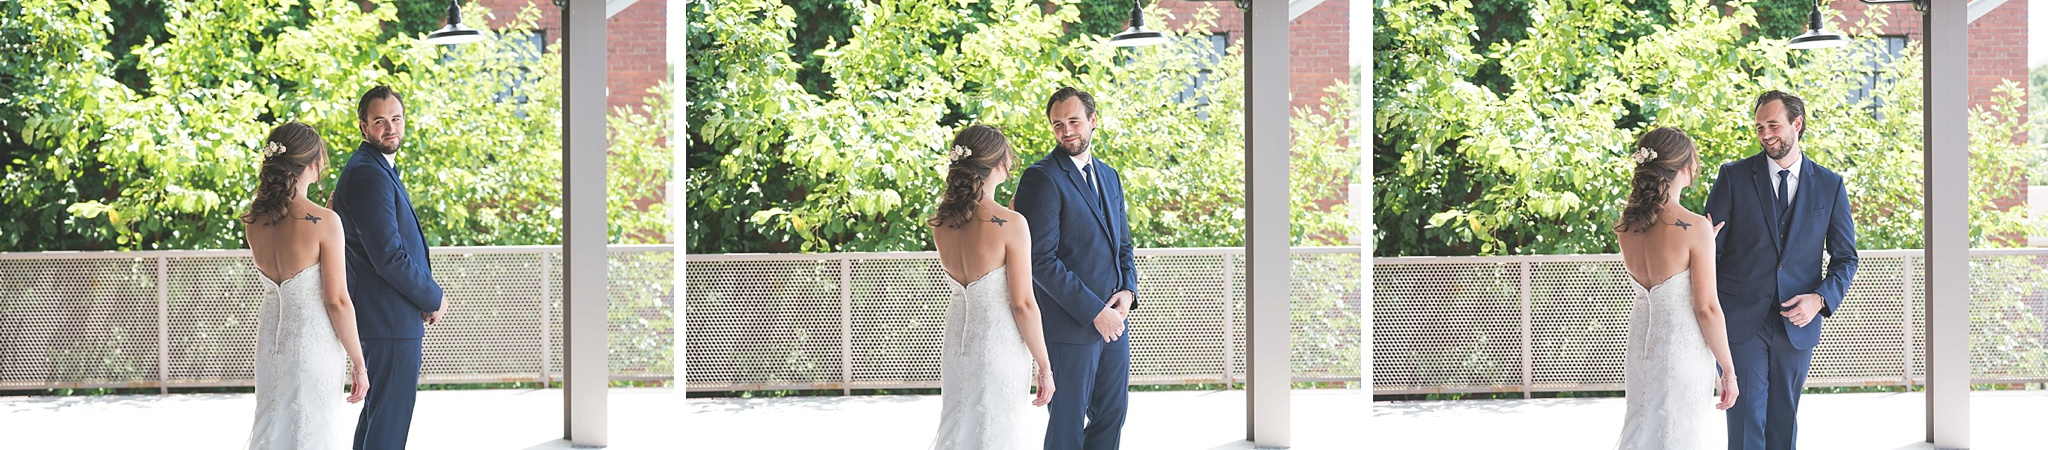 Rickhouse-Durham-NC-Wedding-Photographer-017.jpg